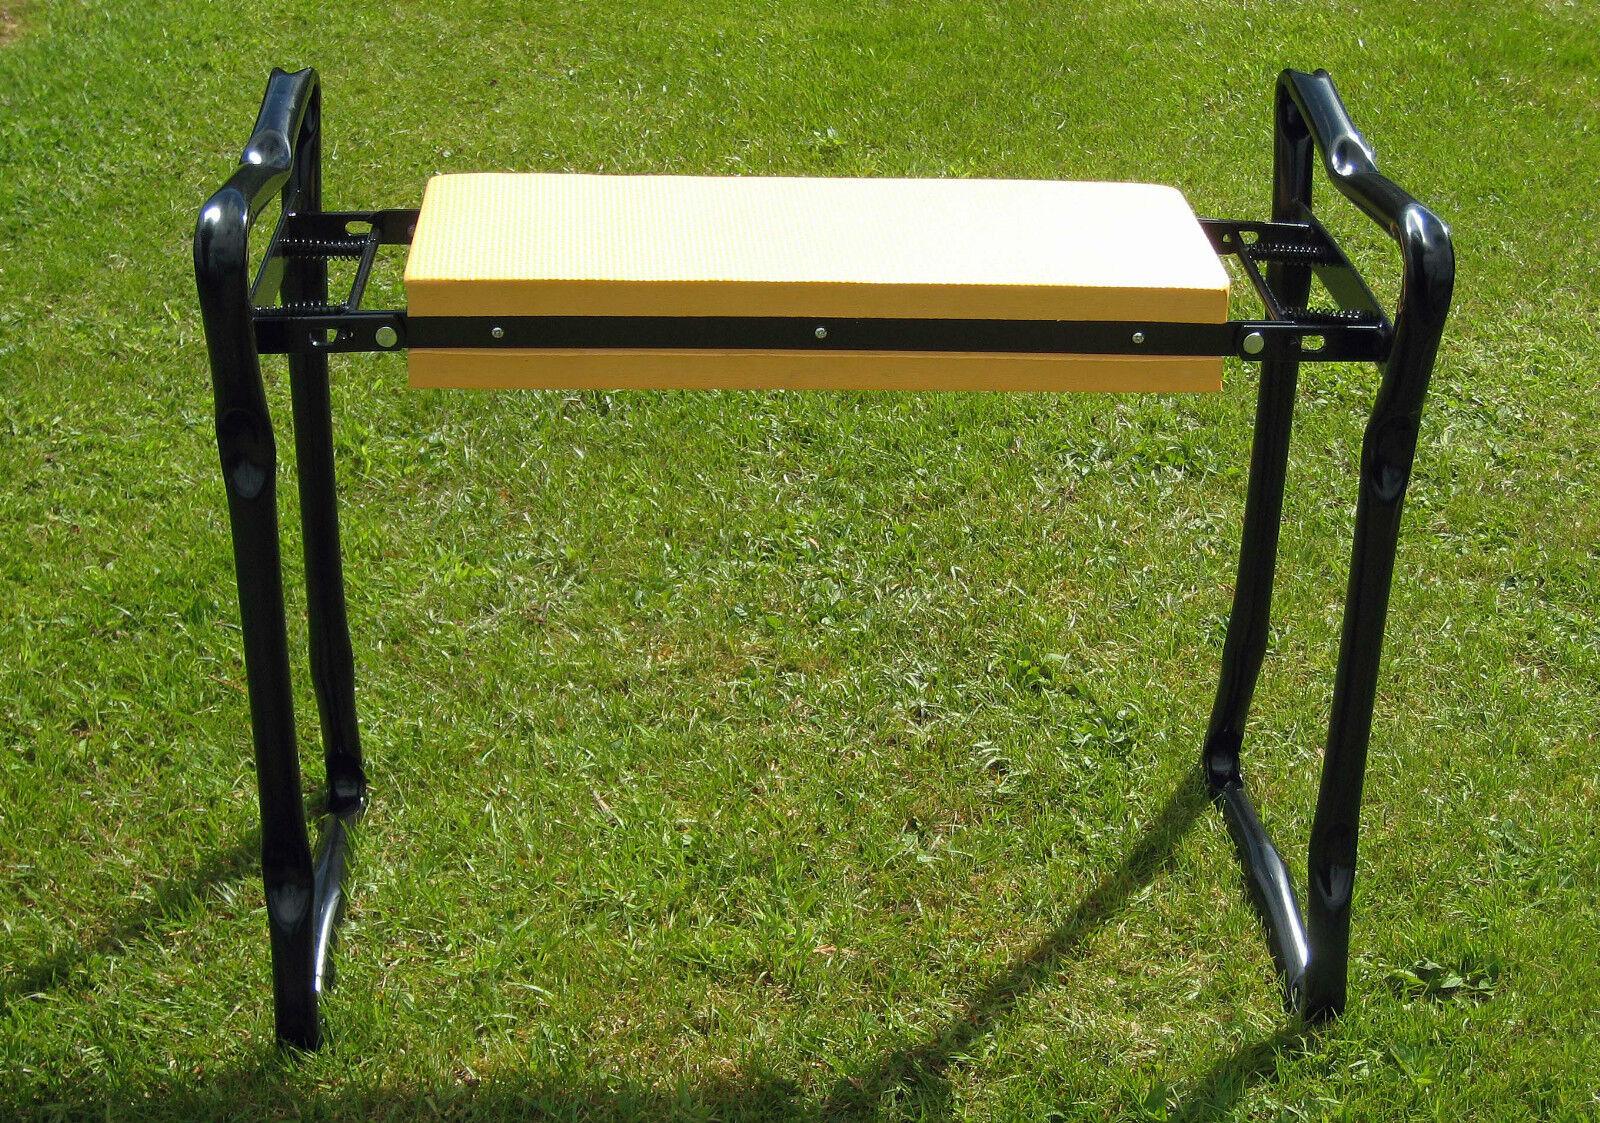 Garden Kneeler Seat Kneeling Pad Folding Kneeling Mats Garden Padded Stool Chair